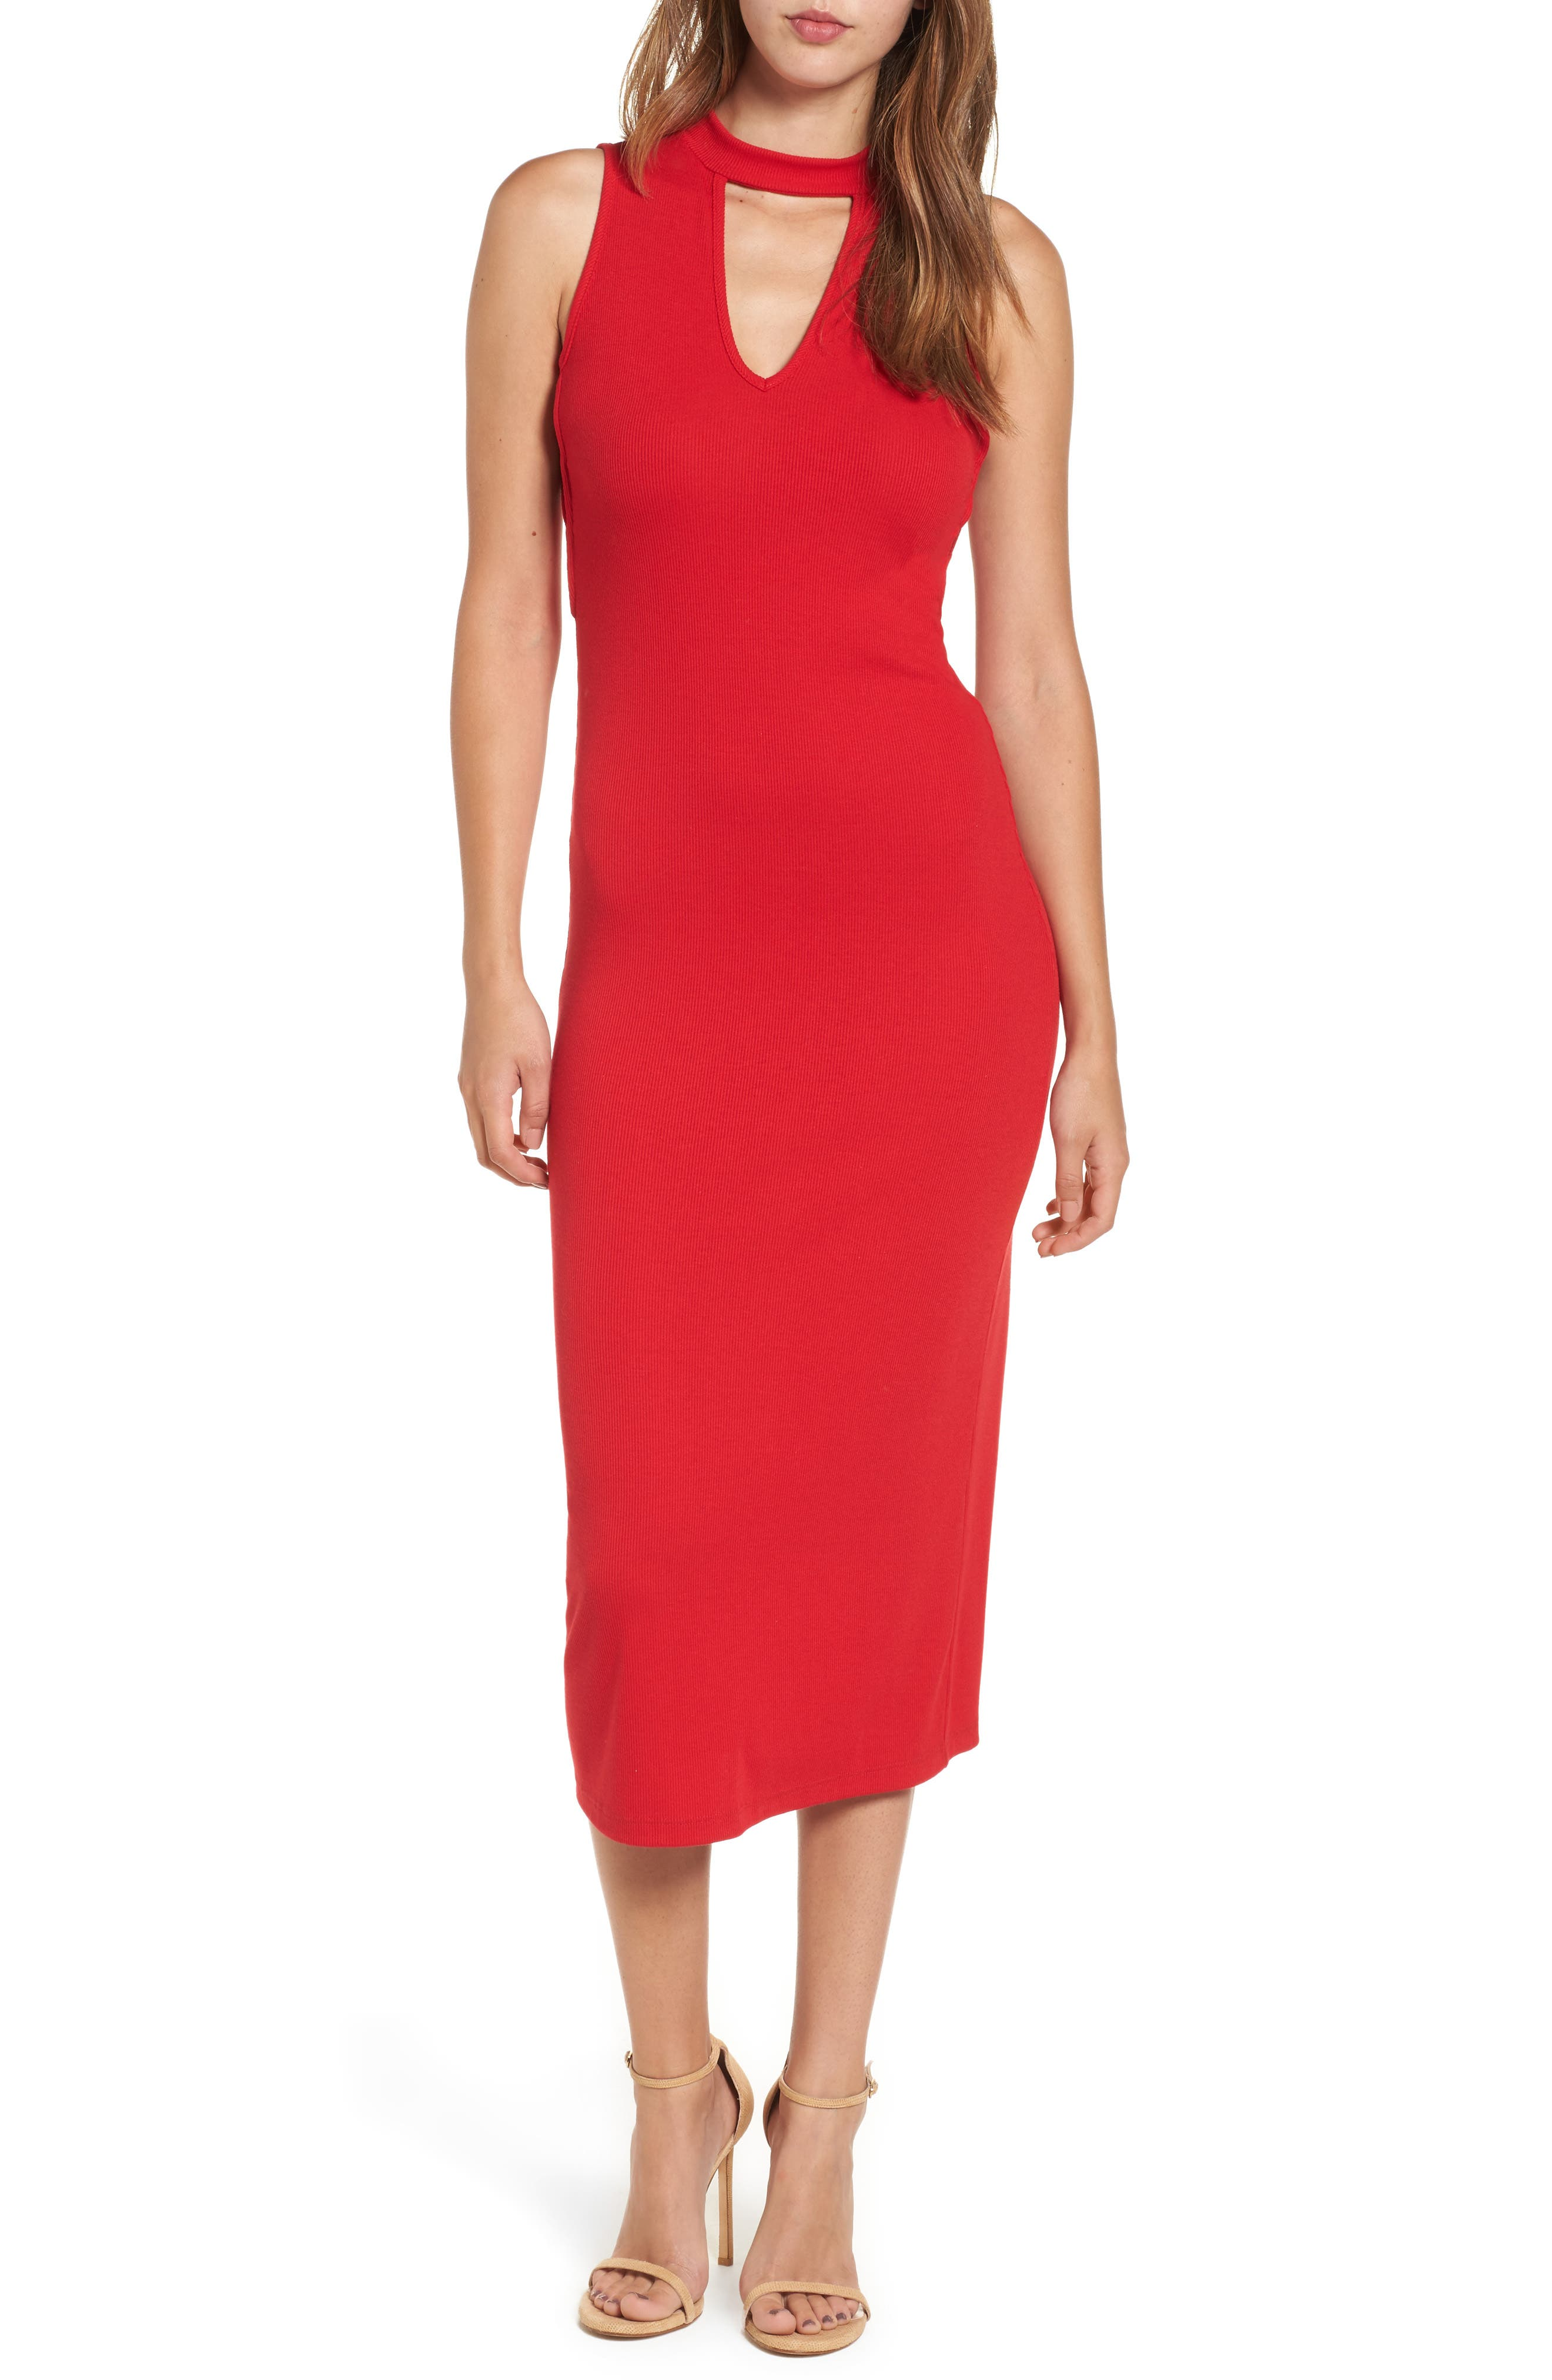 Soprano Body-Con Knit Dress